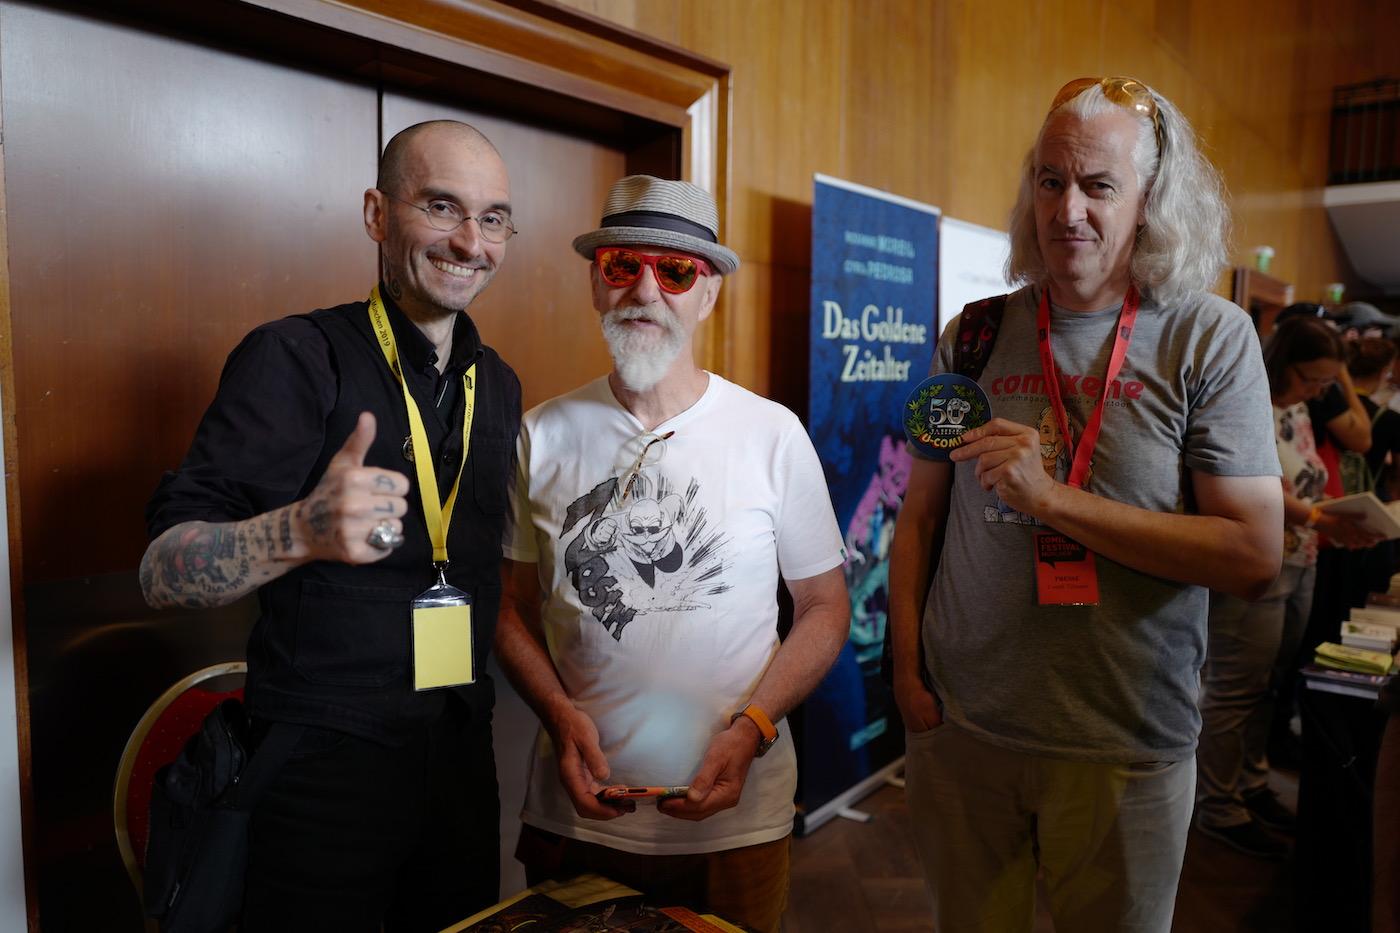 mark_benecke_comic_festival_muenchen_munich_comic_con_2019 - 22.jpg